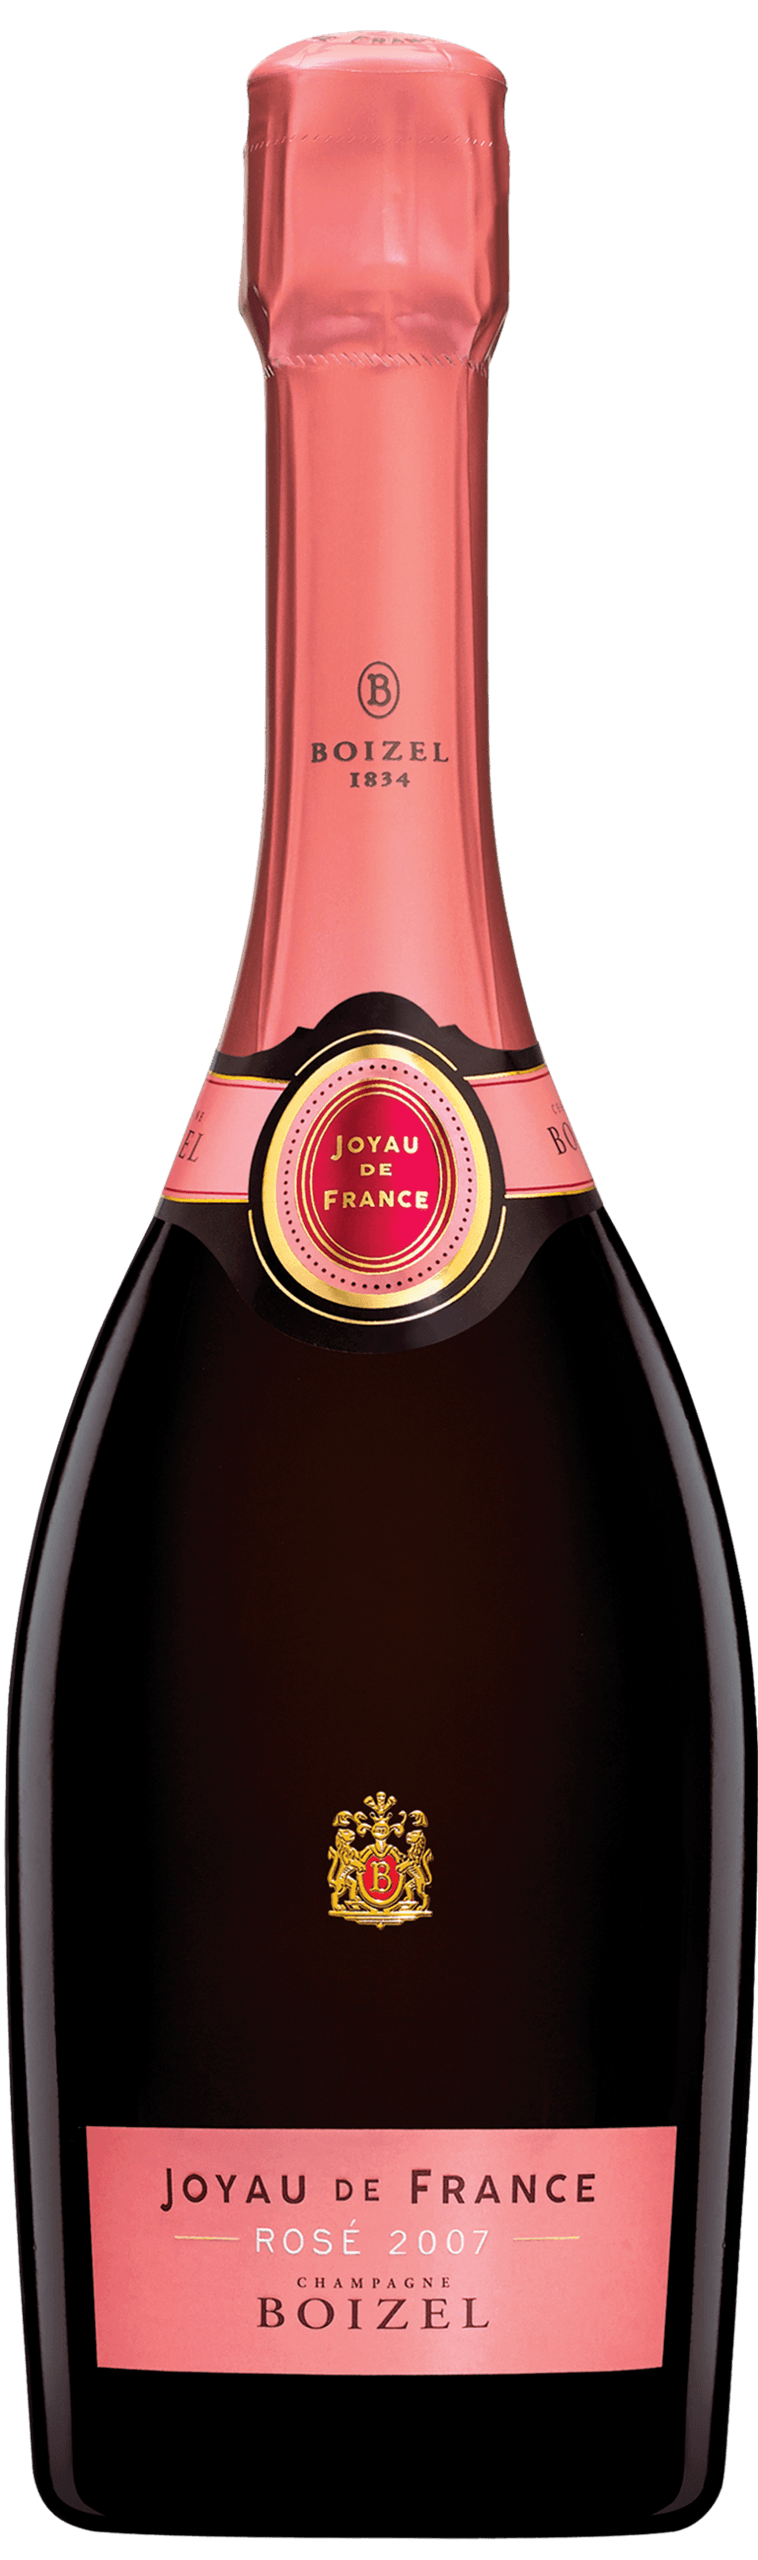 Joyau de France Rosé 2007 - Champagne Boizel - Epernay France